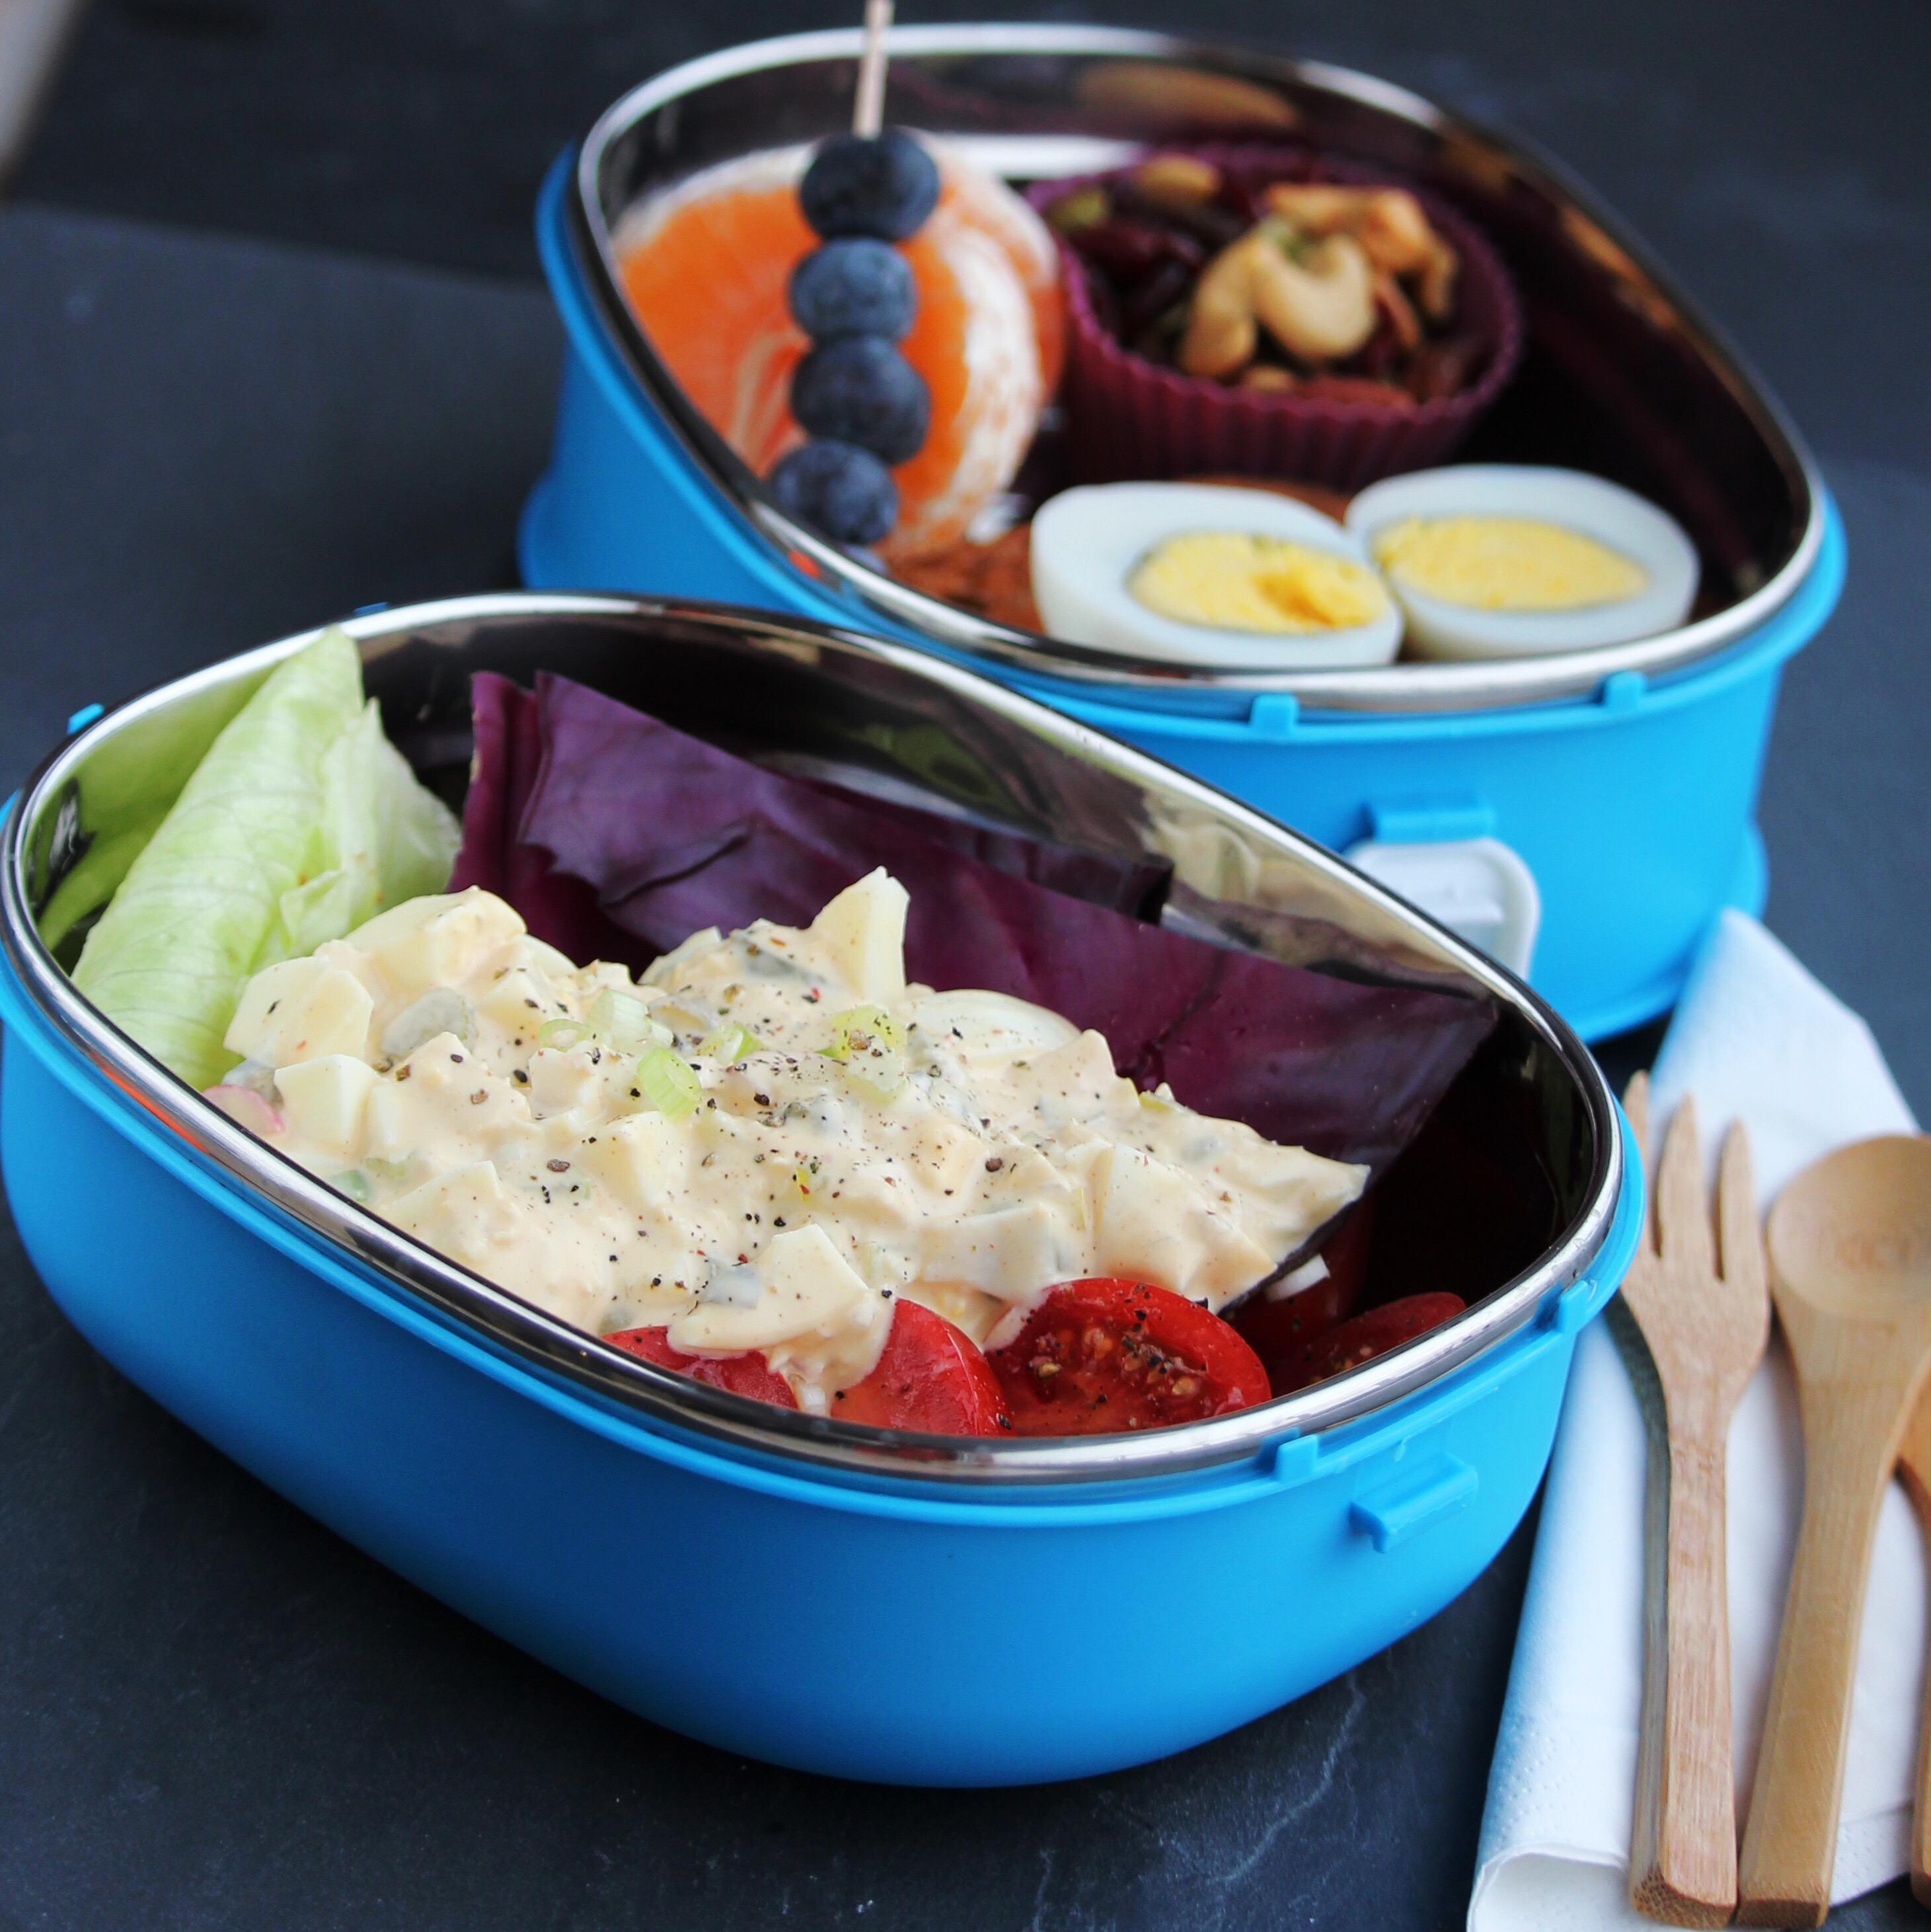 Tuna Egg Salad Bento Box